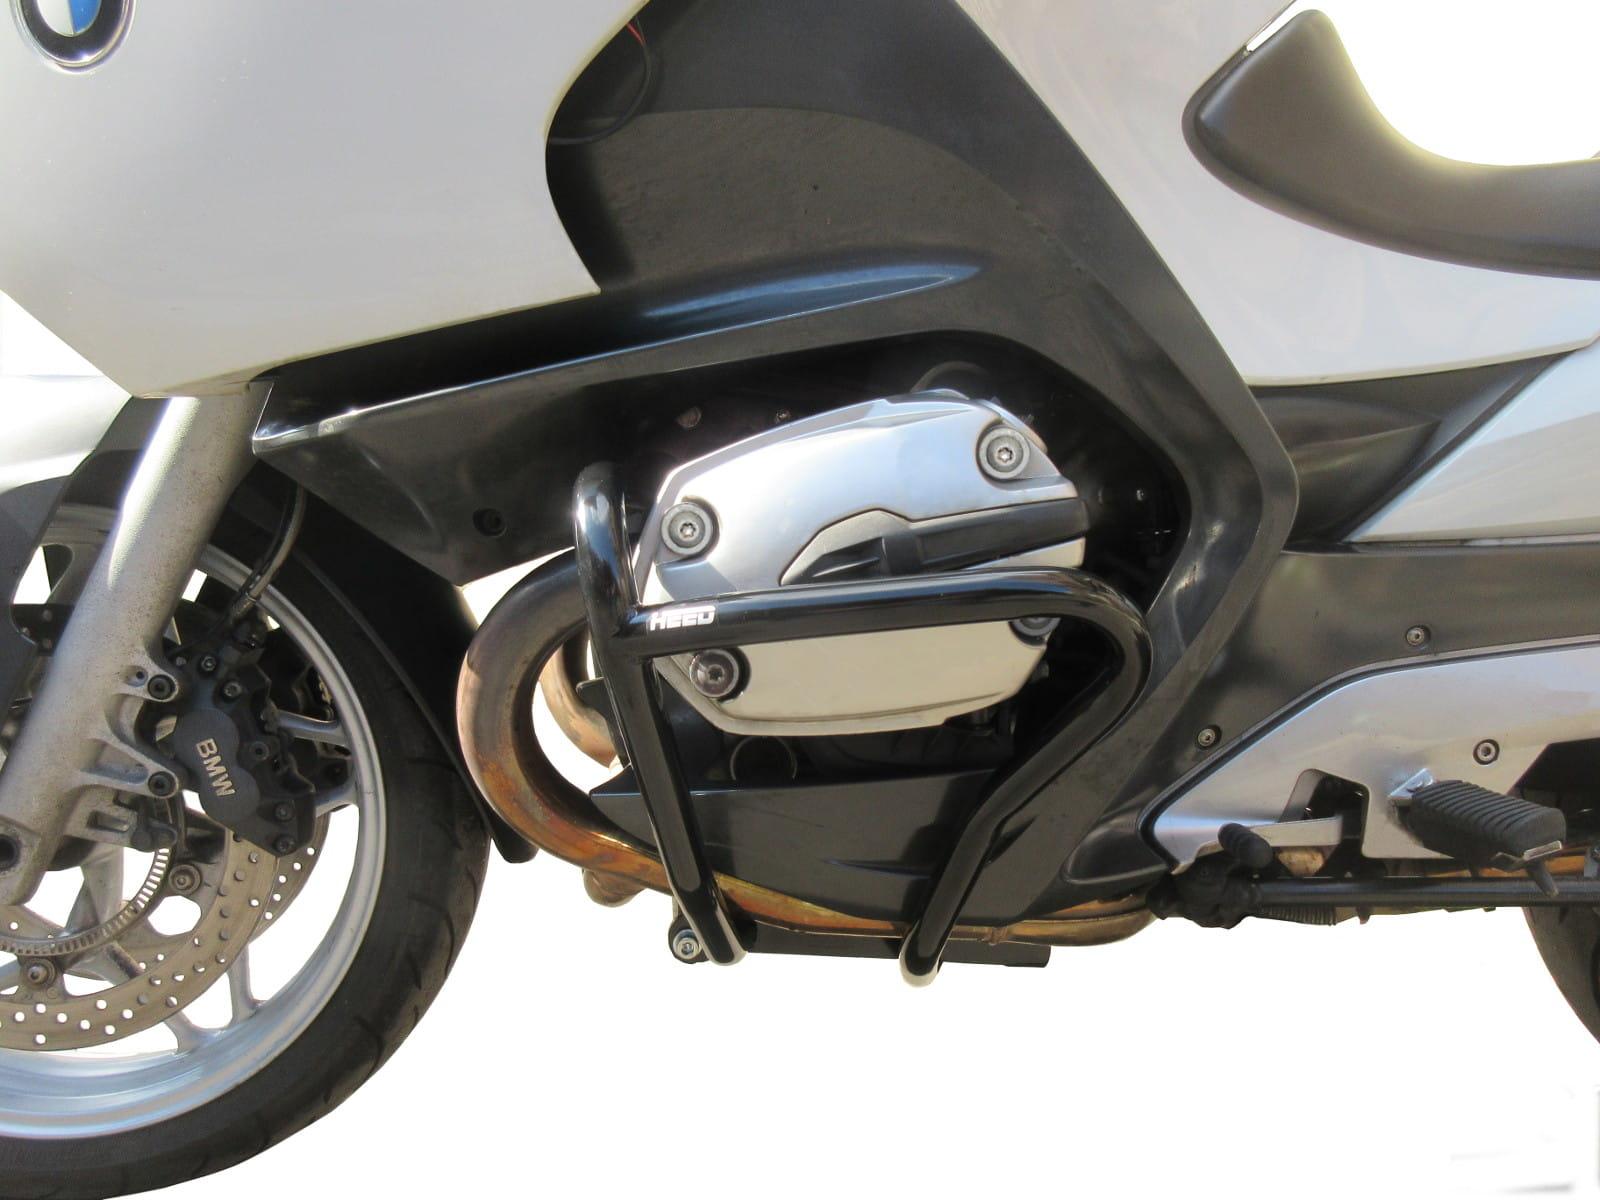 MotorFansClub Rear Crash Bar Fit For Compatible With BMW R1200RT Rear Bar Highway Crash Bars 2005-2013 Black